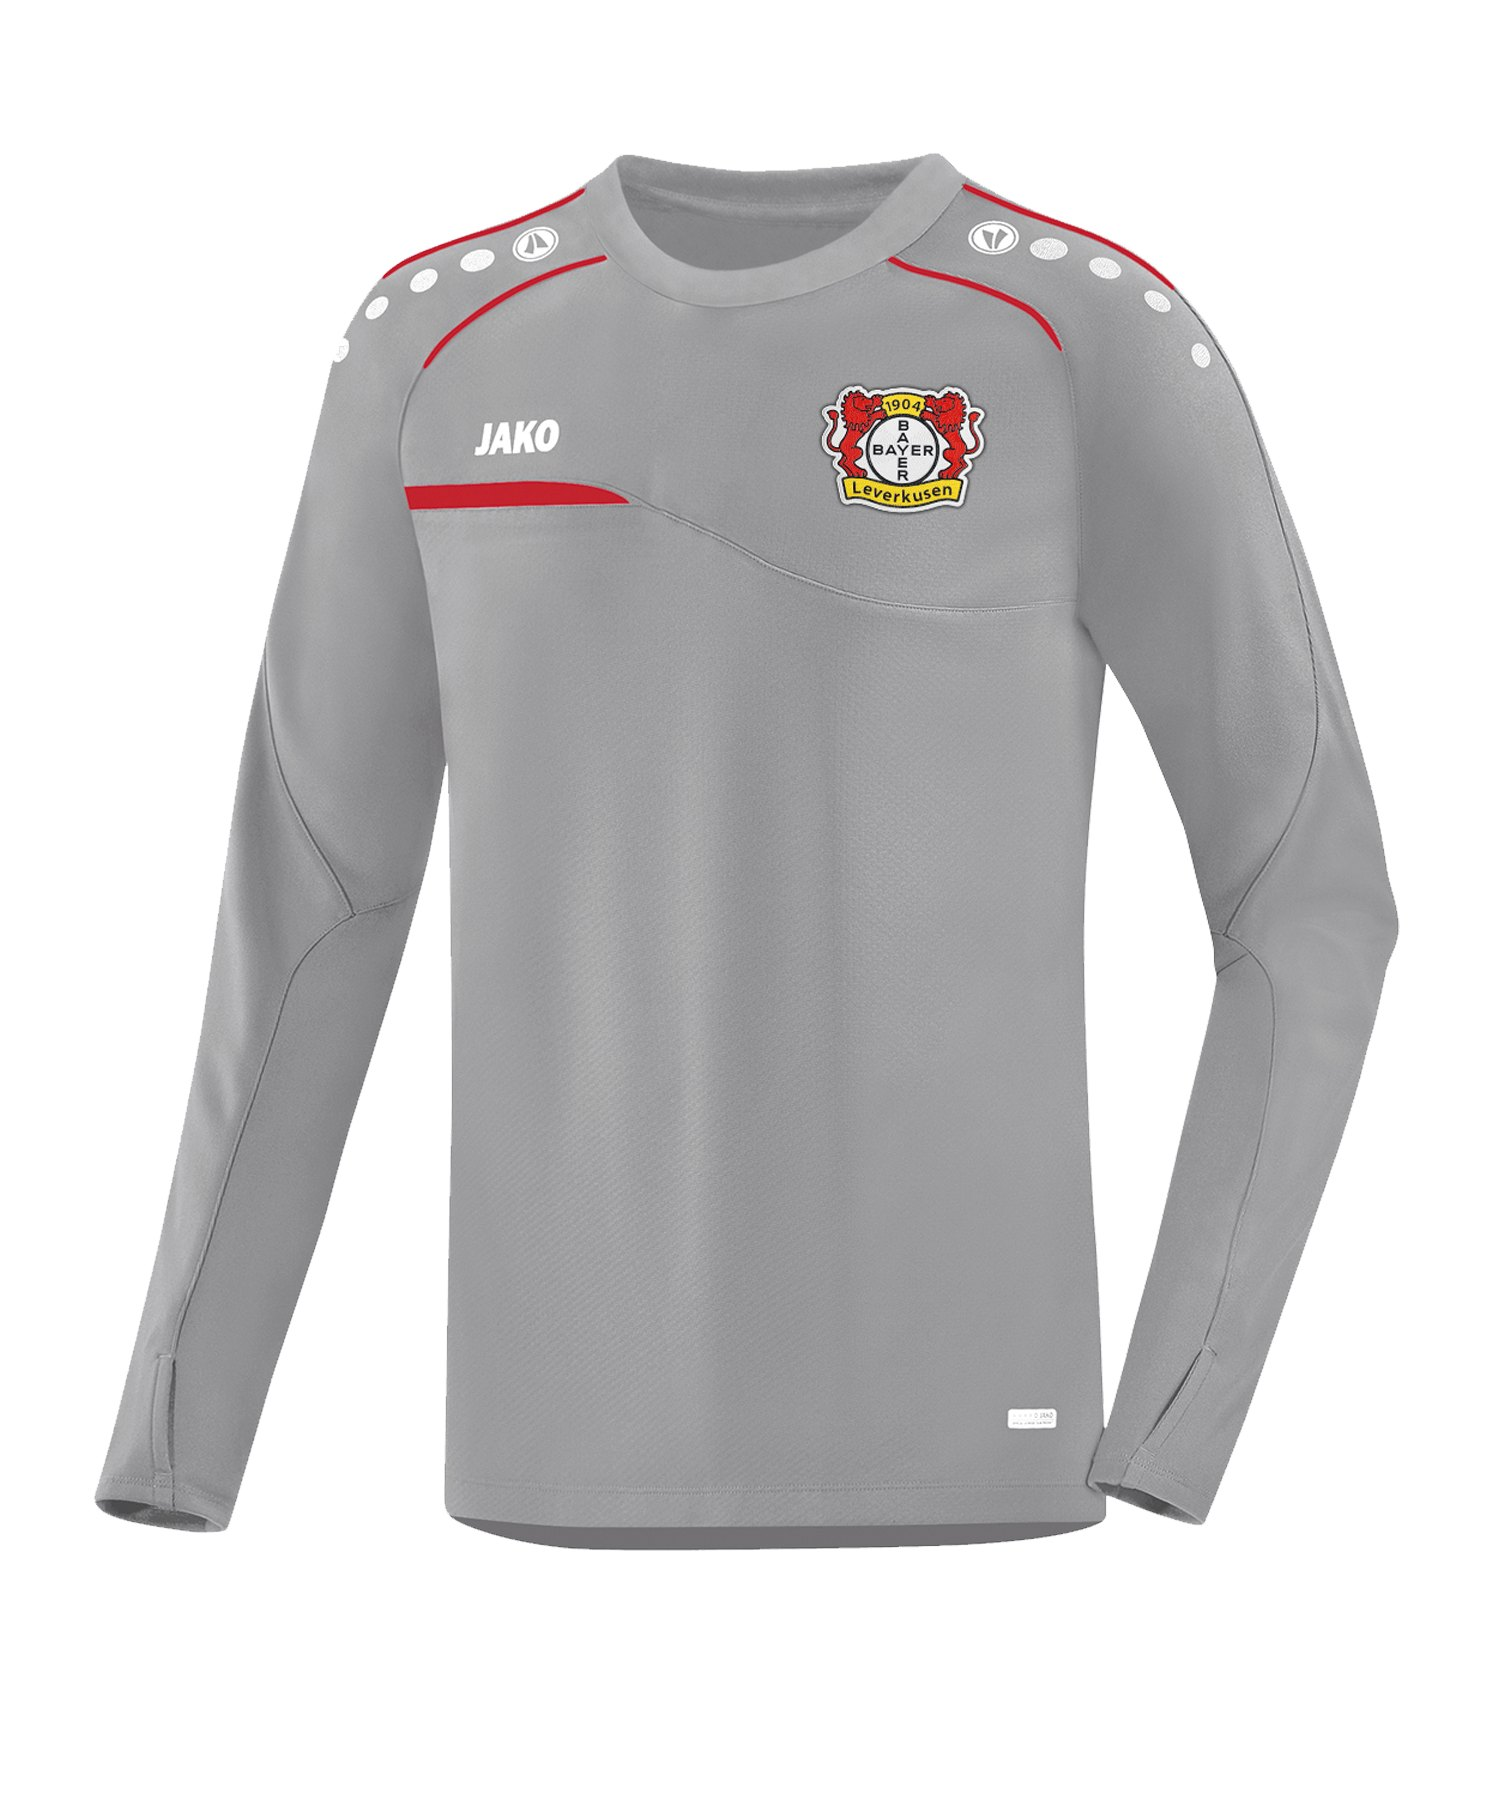 JAKO Bayer 04 Leverkusen Sweatshirt Prestige Grau F400 - grau